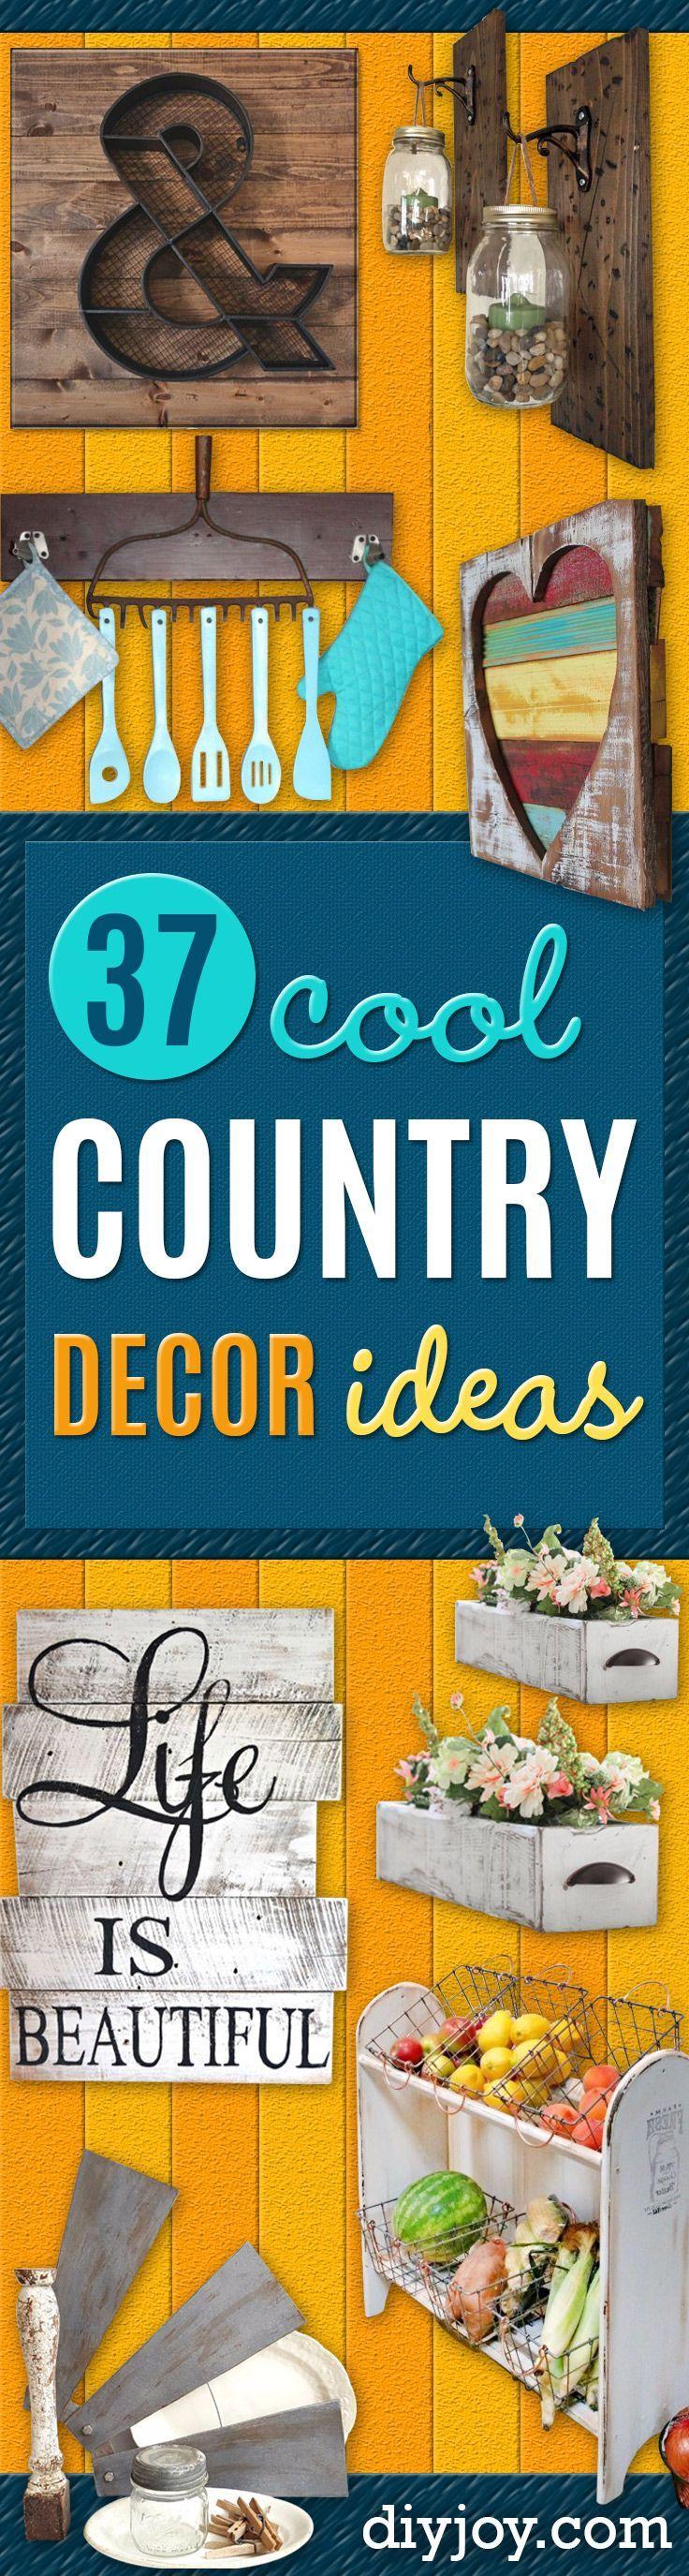 358 best Vintage Wall Art images on Pinterest | Frames, Bedroom and ...